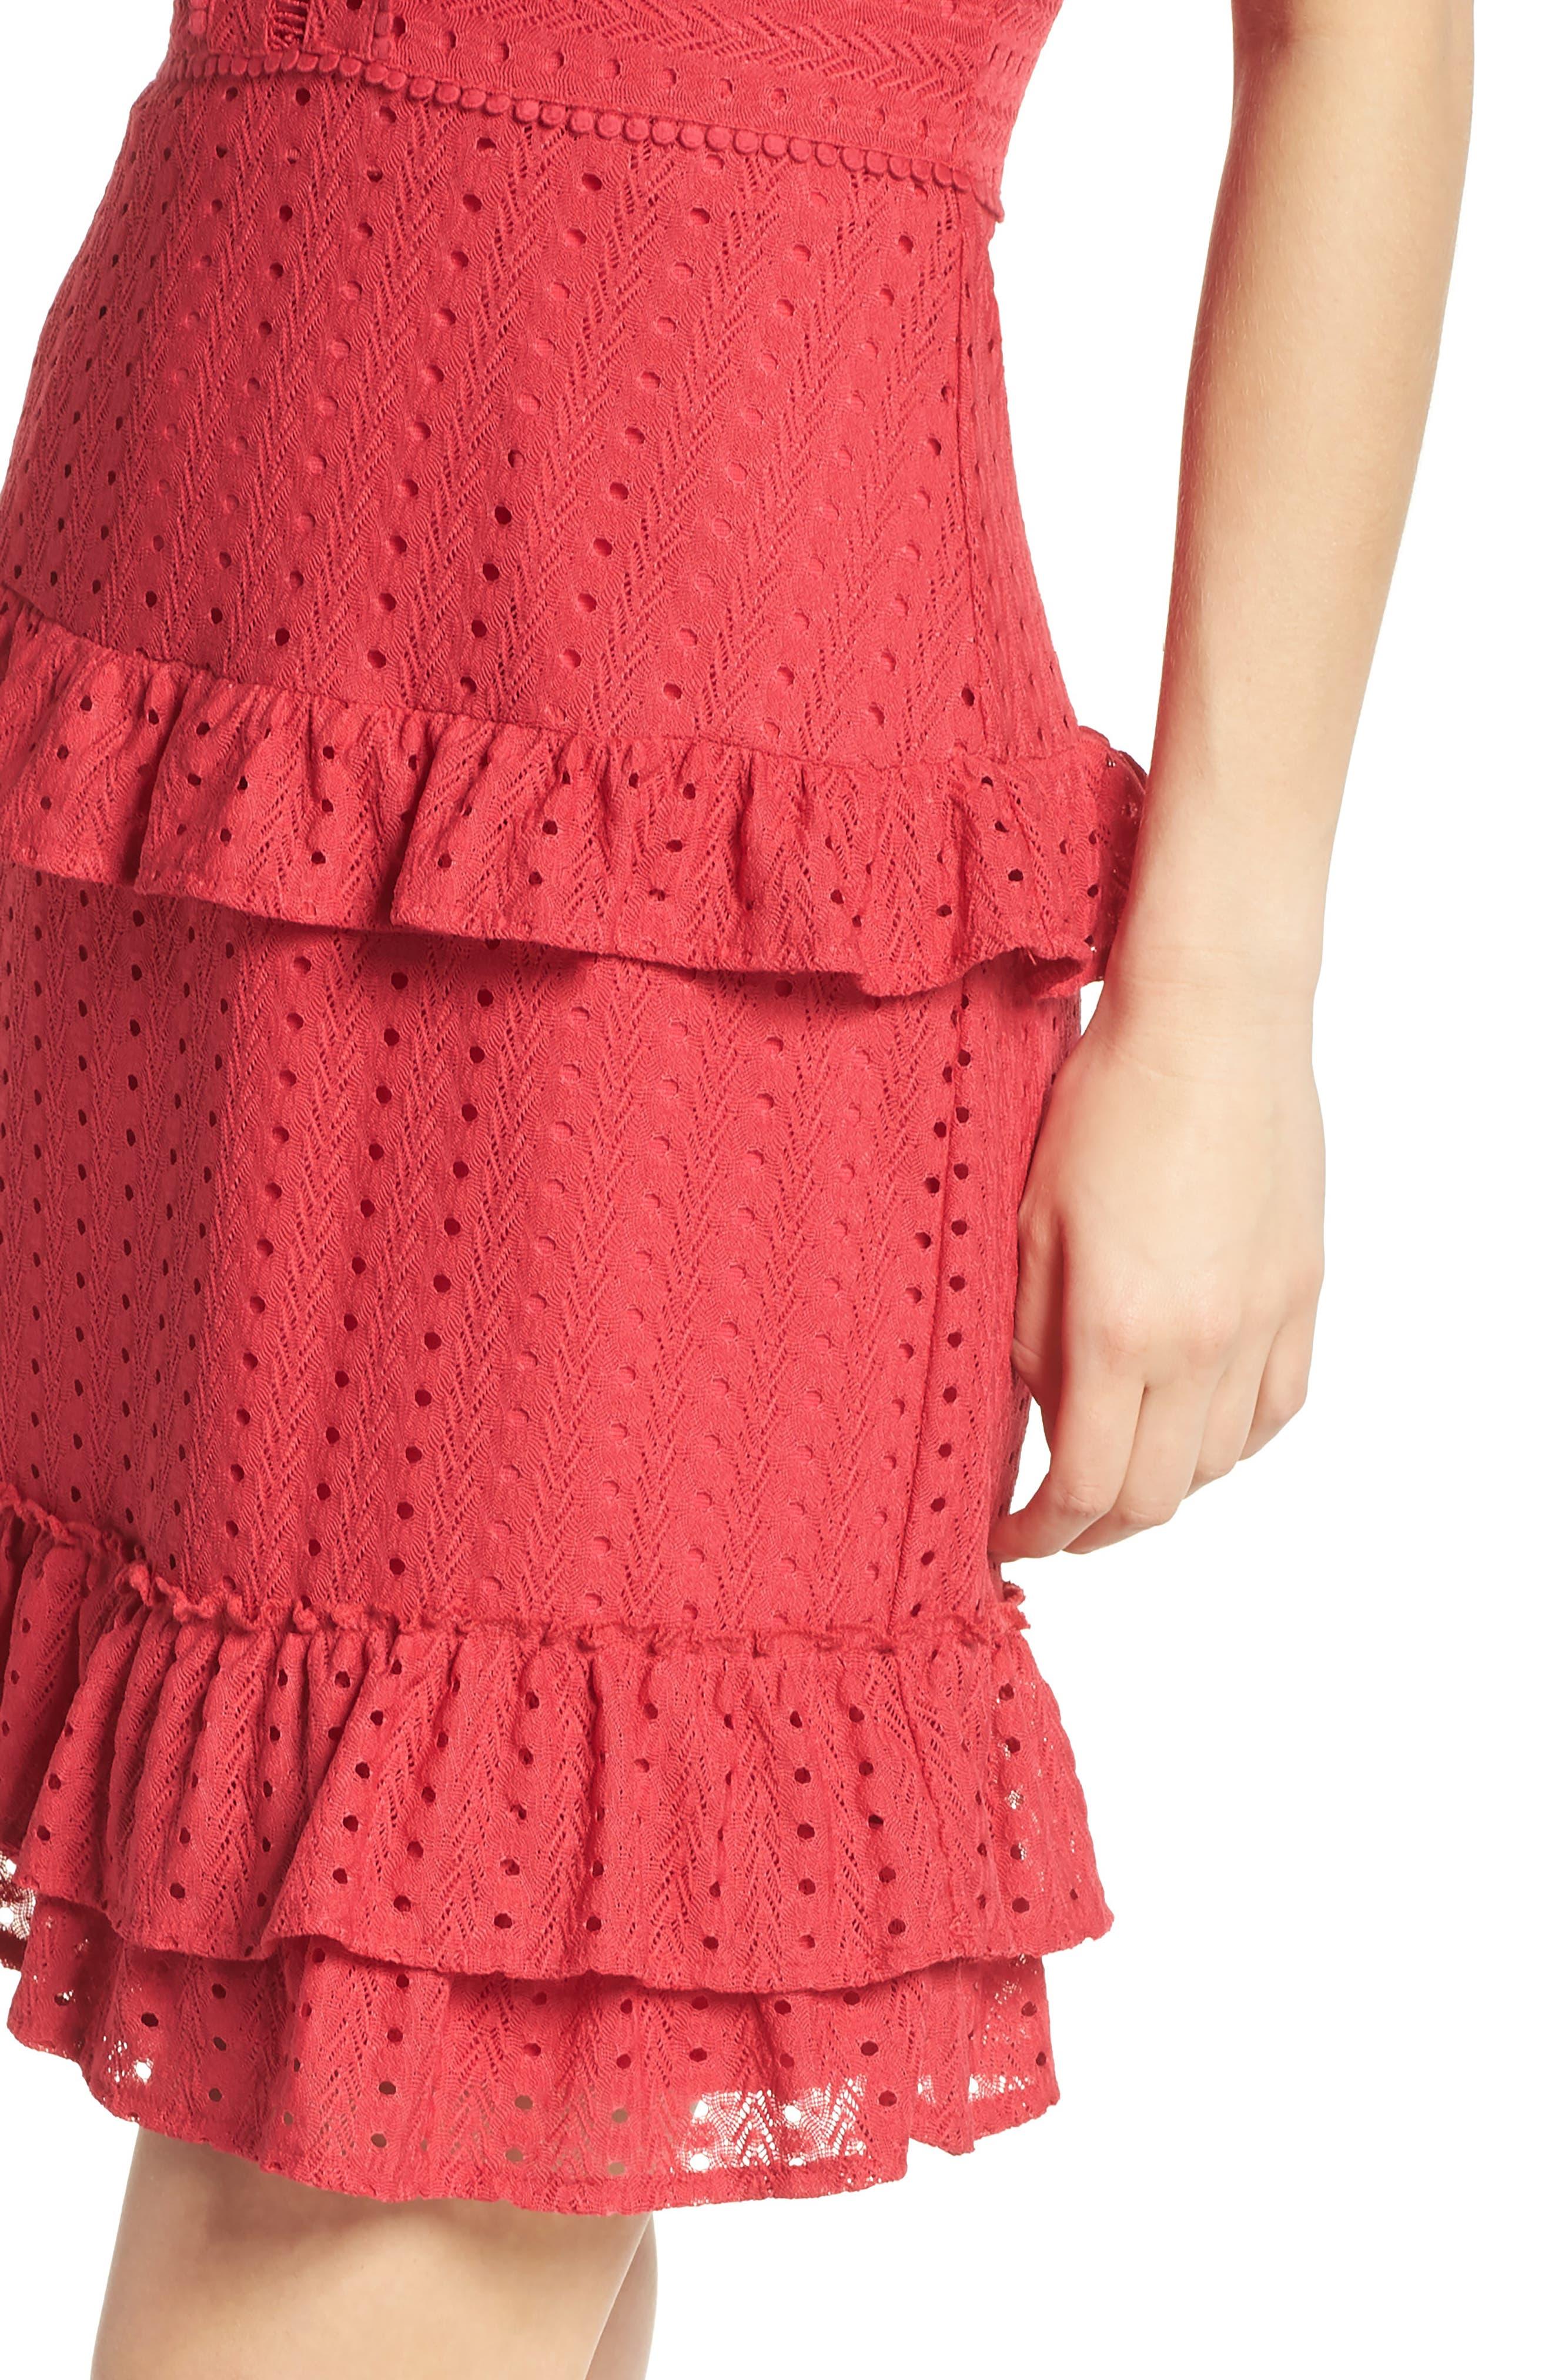 Sleeveless Ruffle Knit Sheath Dress,                             Alternate thumbnail 4, color,                             Pink Rose